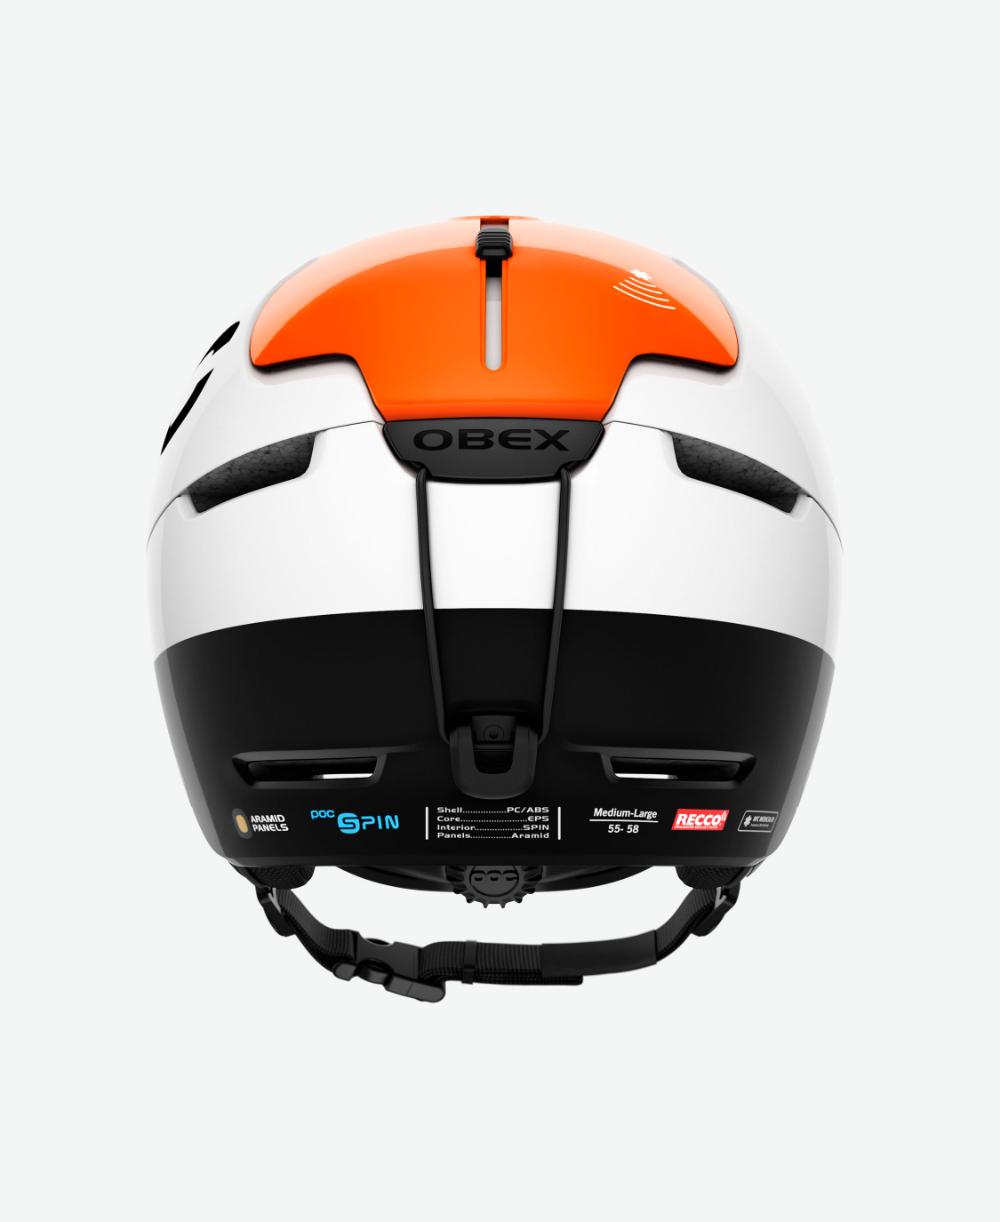 POC Obex BC SPIN Snow Helmet Helmet, Poc goggles